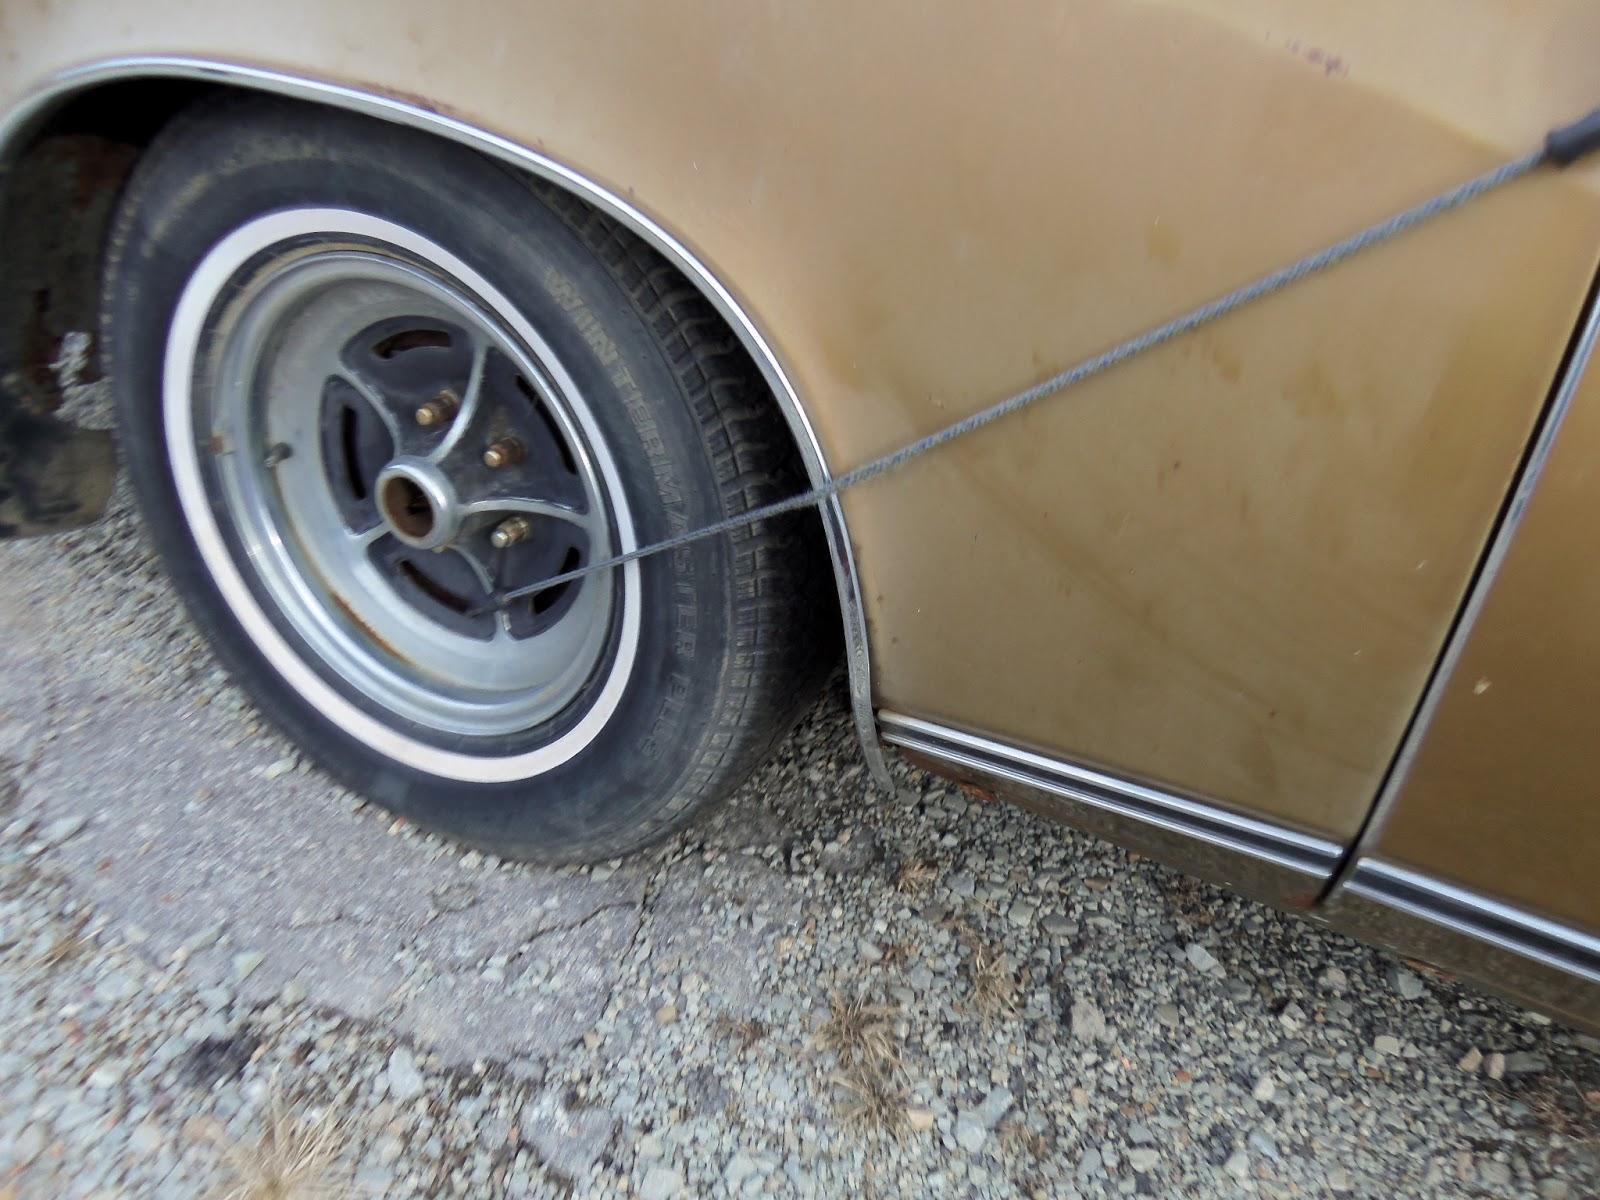 1969 Buick Riviera GS Craigslist Capture